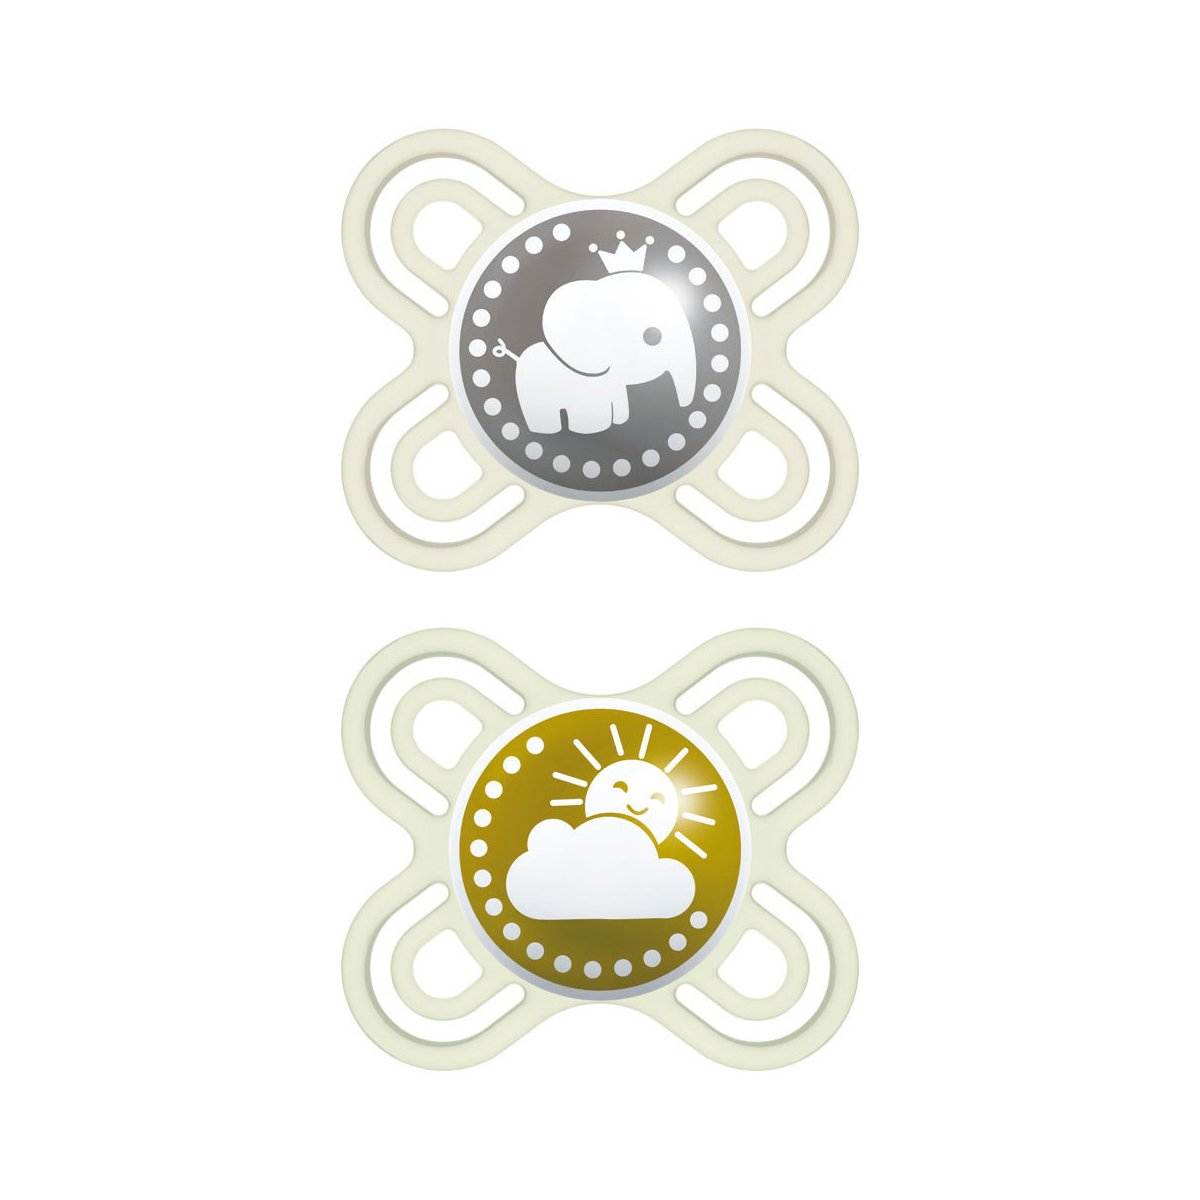 Mam Perfect Start Fairytale Ορθοδοντική Πιπίλα Σιλικόνης Ειδικά Σχεδιασμένη για Νεογέννητο Κωδ 081S από 0 Έως 2 Μηνών 2 Τεμάχια